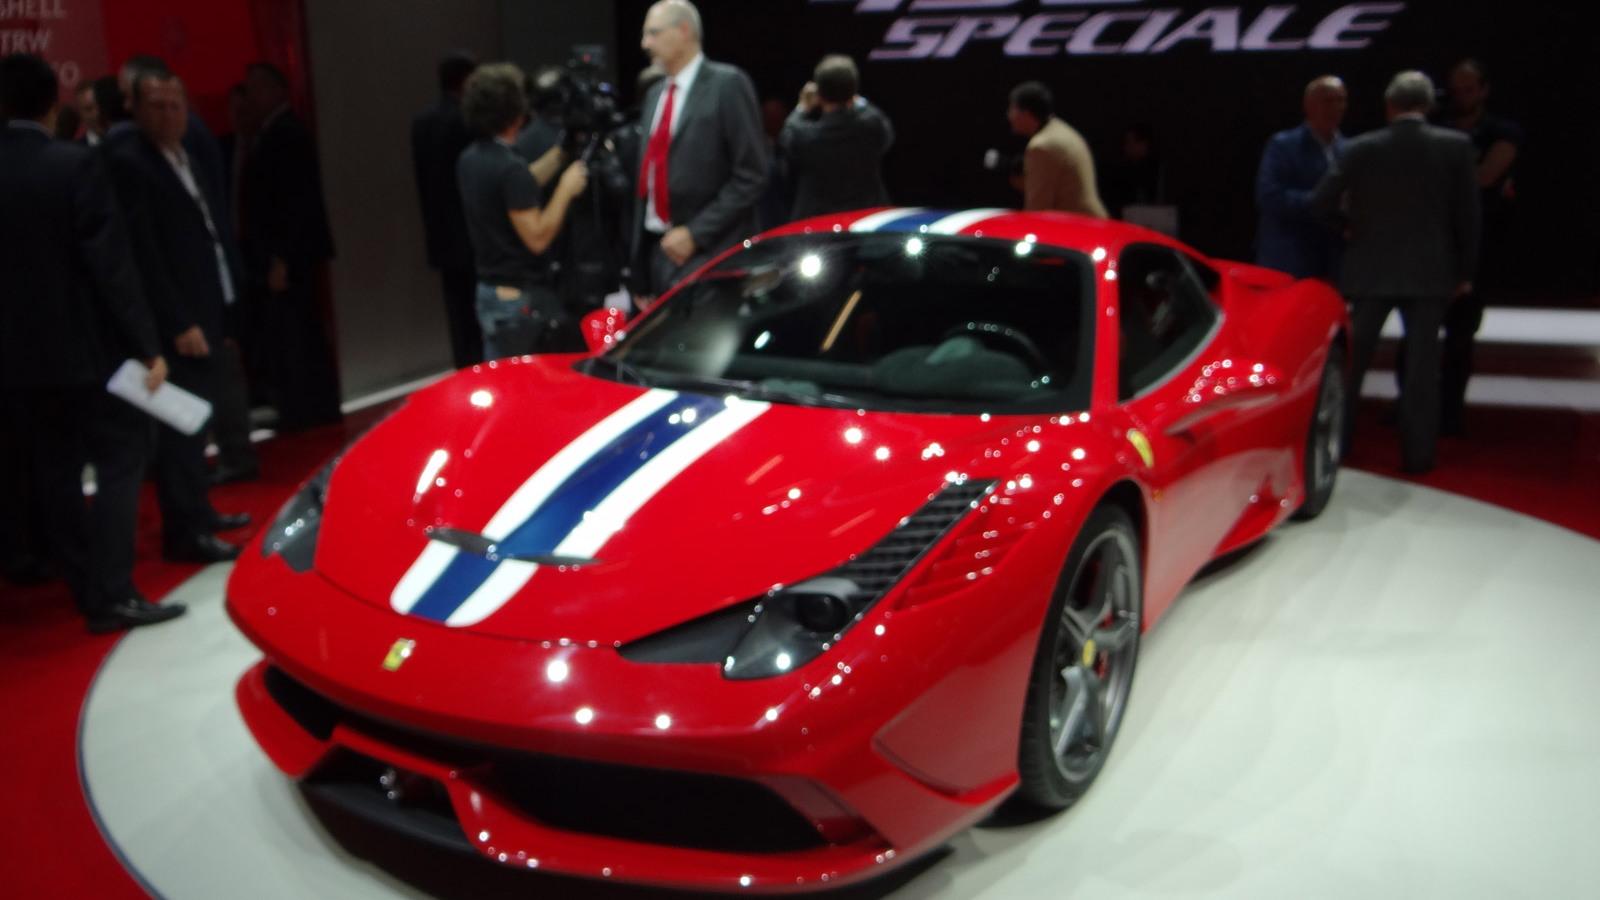 Ferrari 458 Speciale, 2013 Frankfurt Auto Show